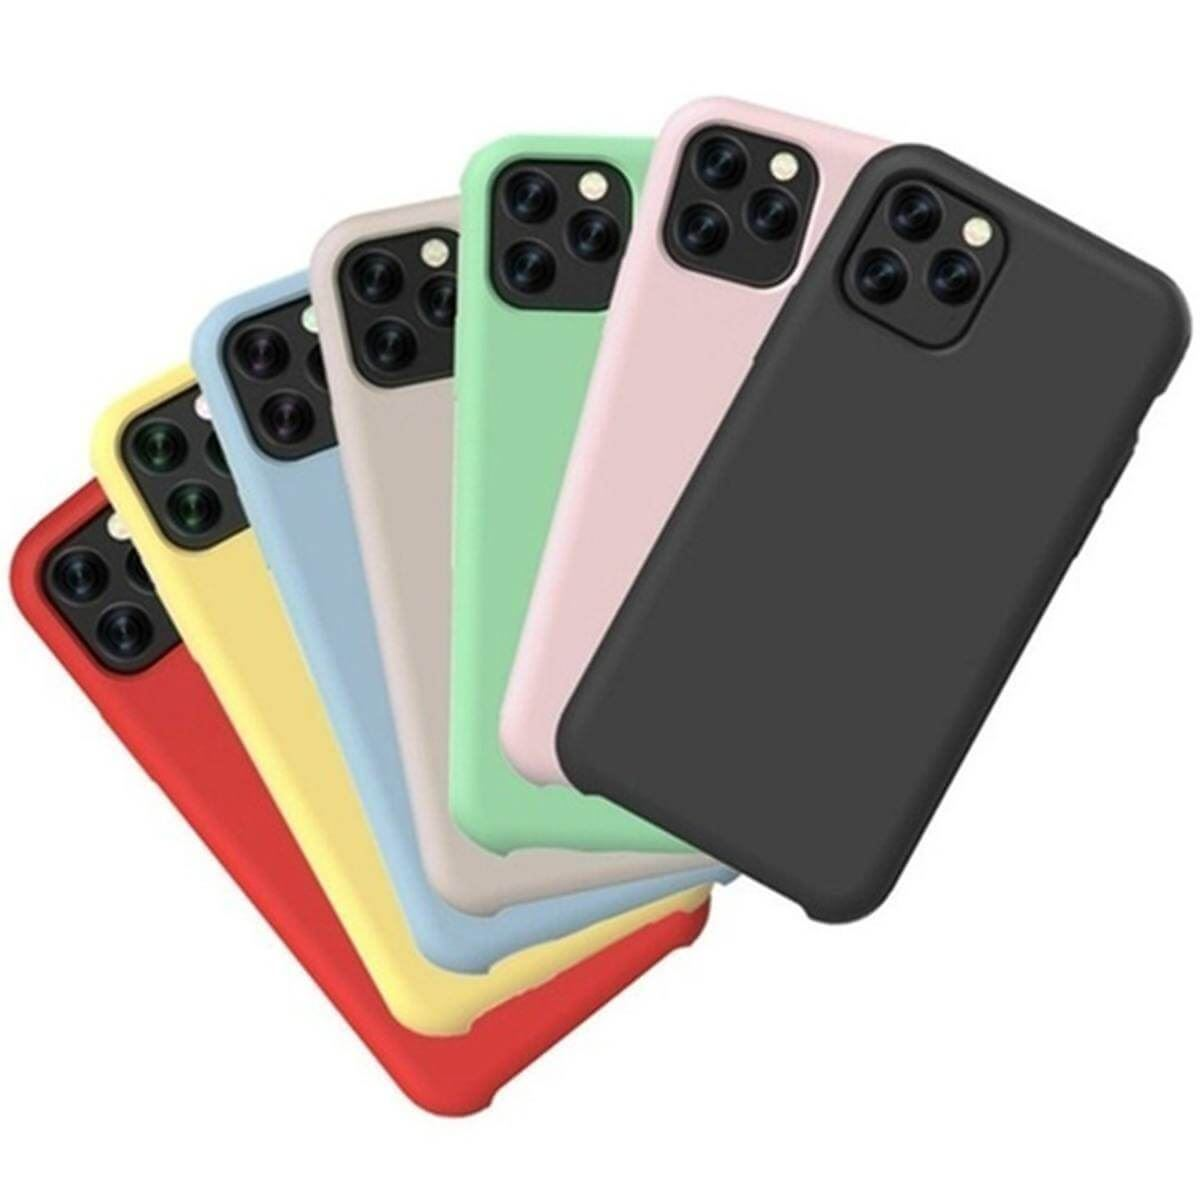 Leather-Slim-Case-Apple-iPhone-10-8-7-Plus-6s-5-Original-PU-Soft-Silicone-Cover thumbnail 27